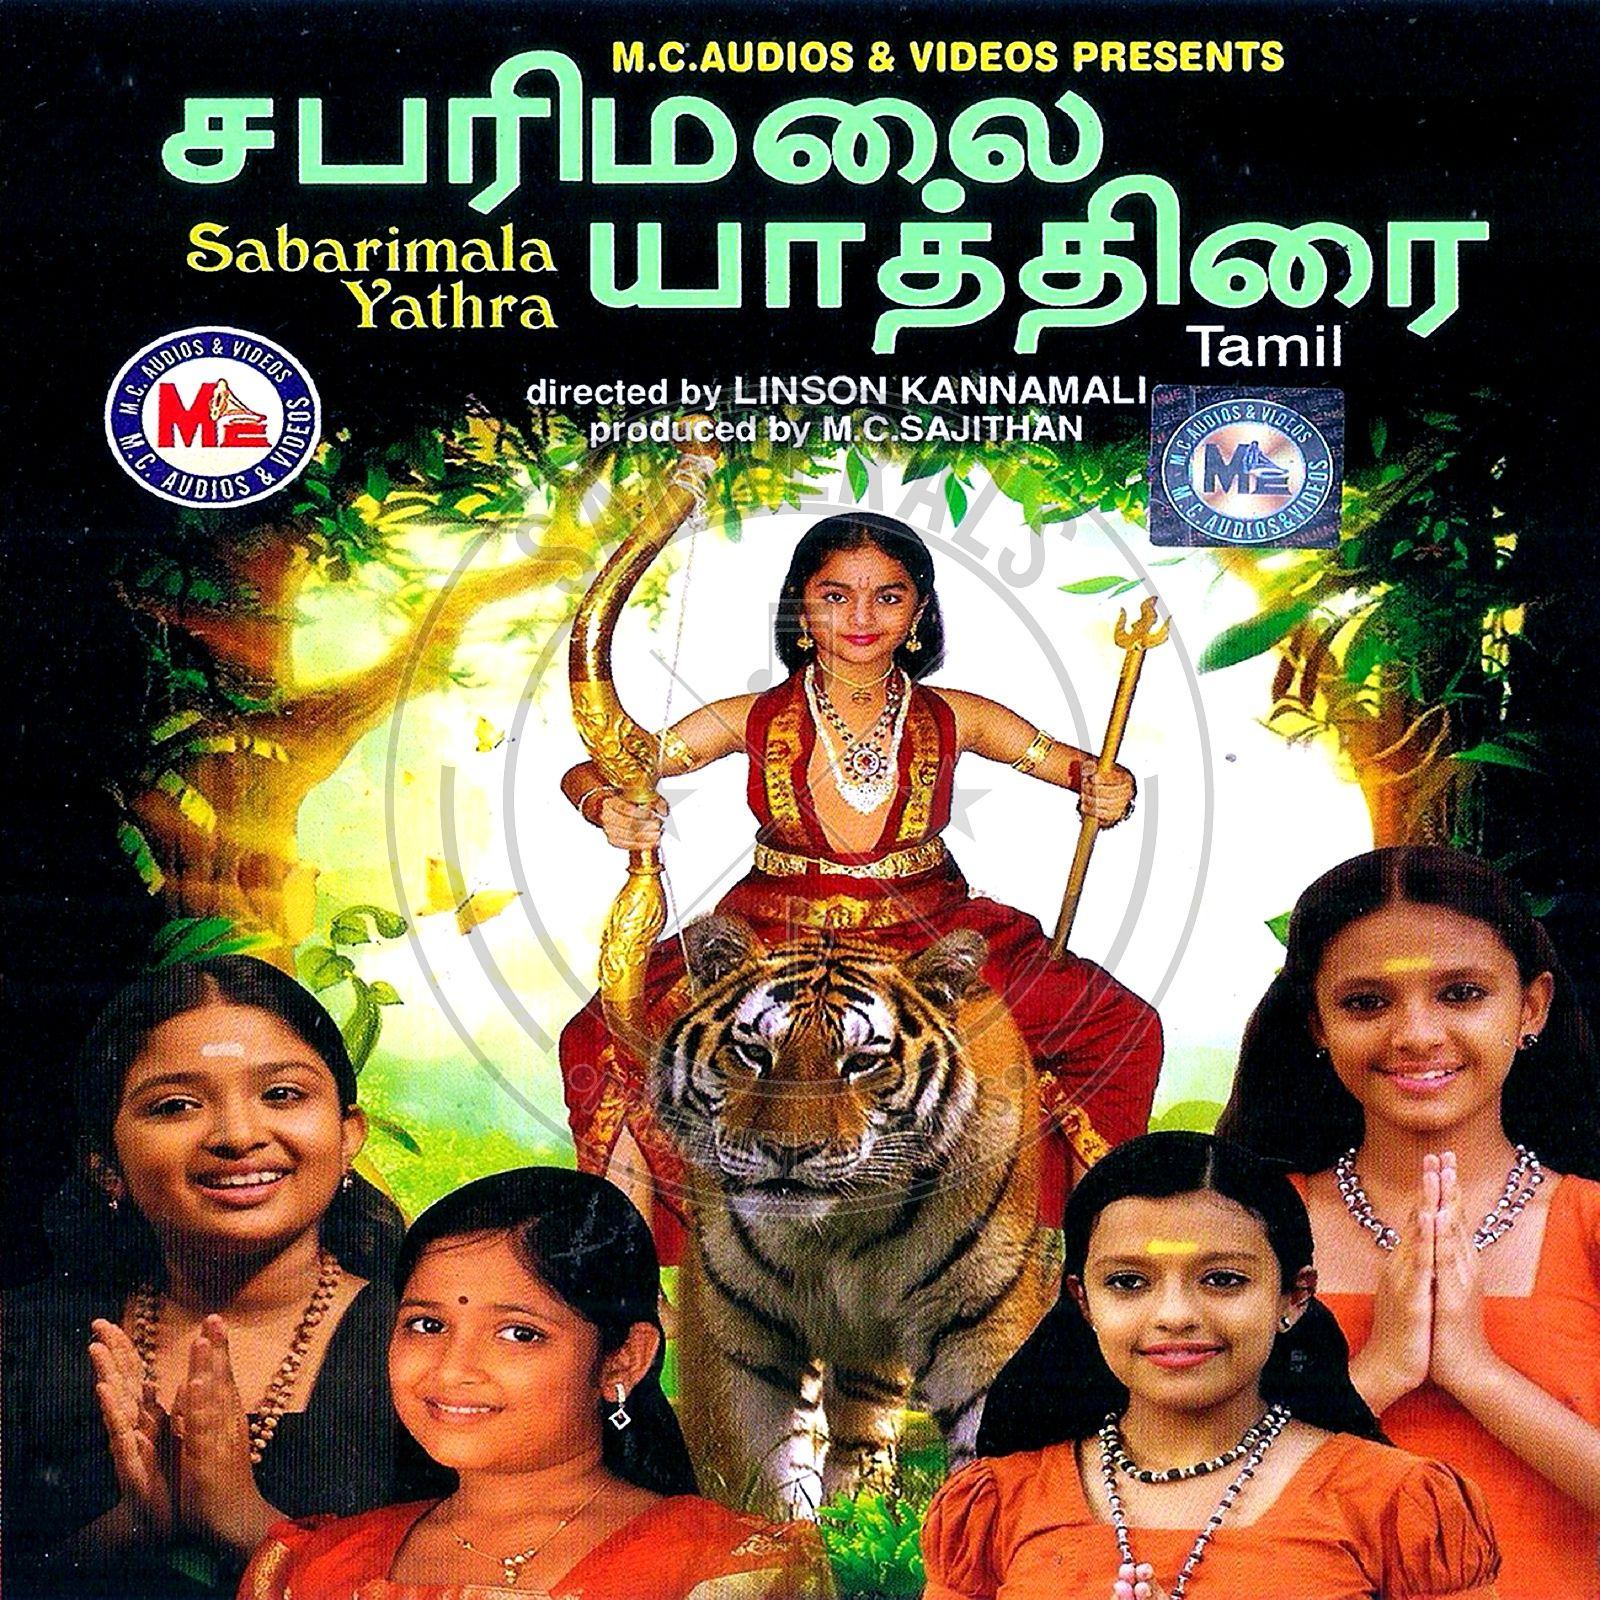 Sabarimalai Yathirai 2007 Digitalrip Wav Mp3 Song Download Songs Mp3 Song